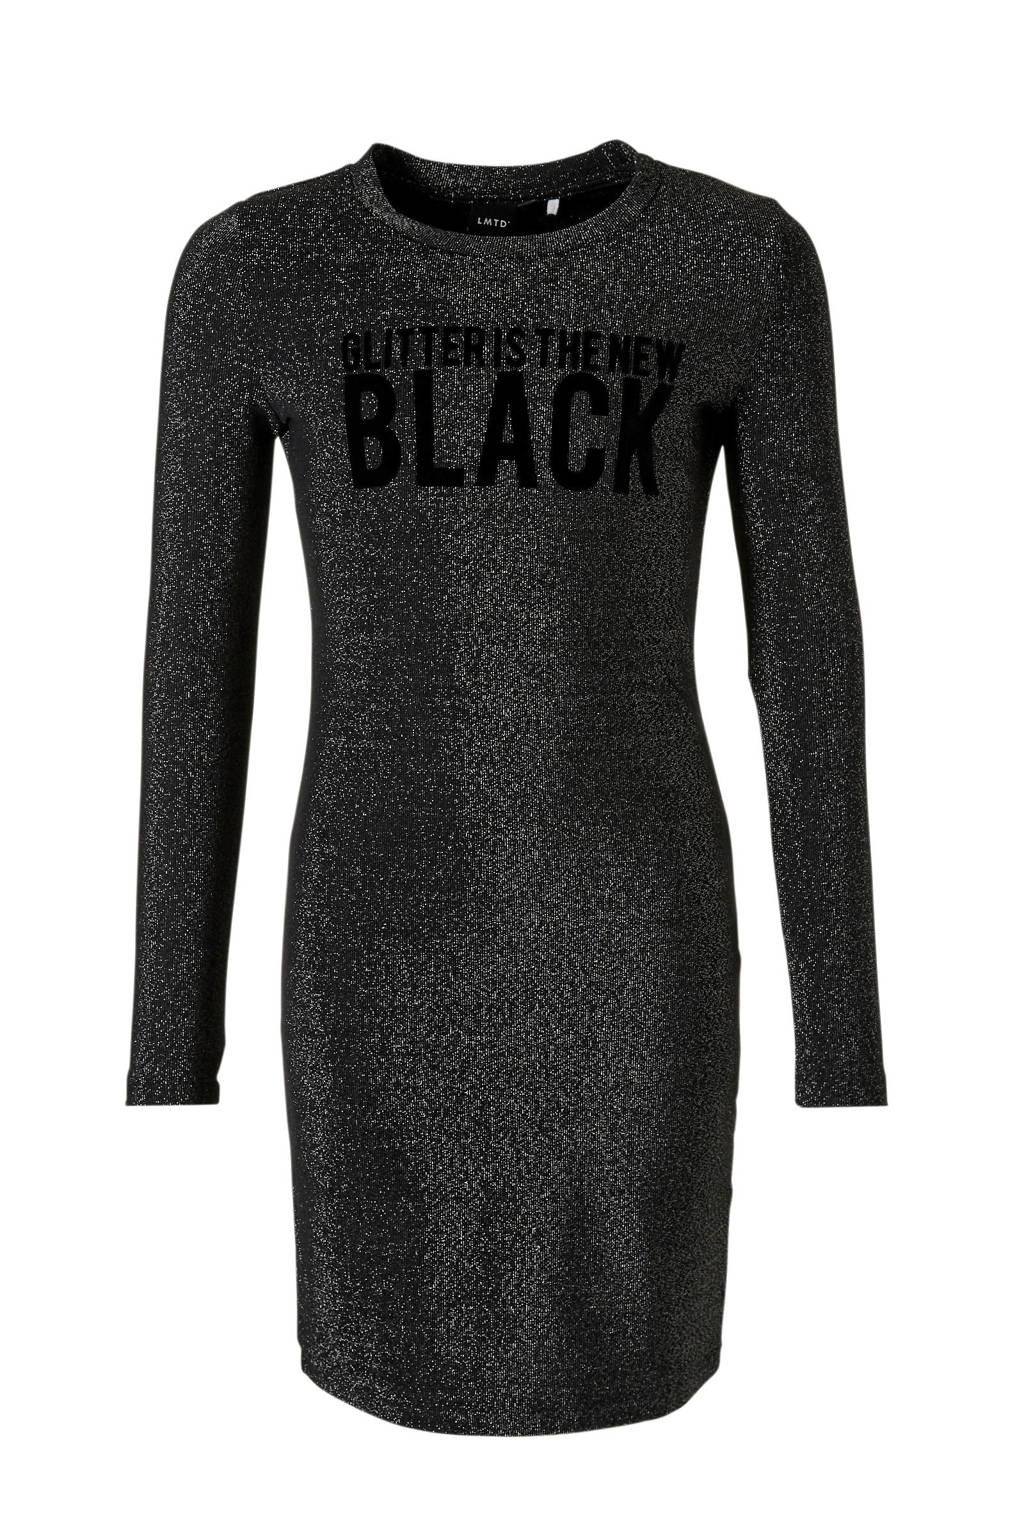 LMTD glitterjurk Siga zwart, Zwart/zilver